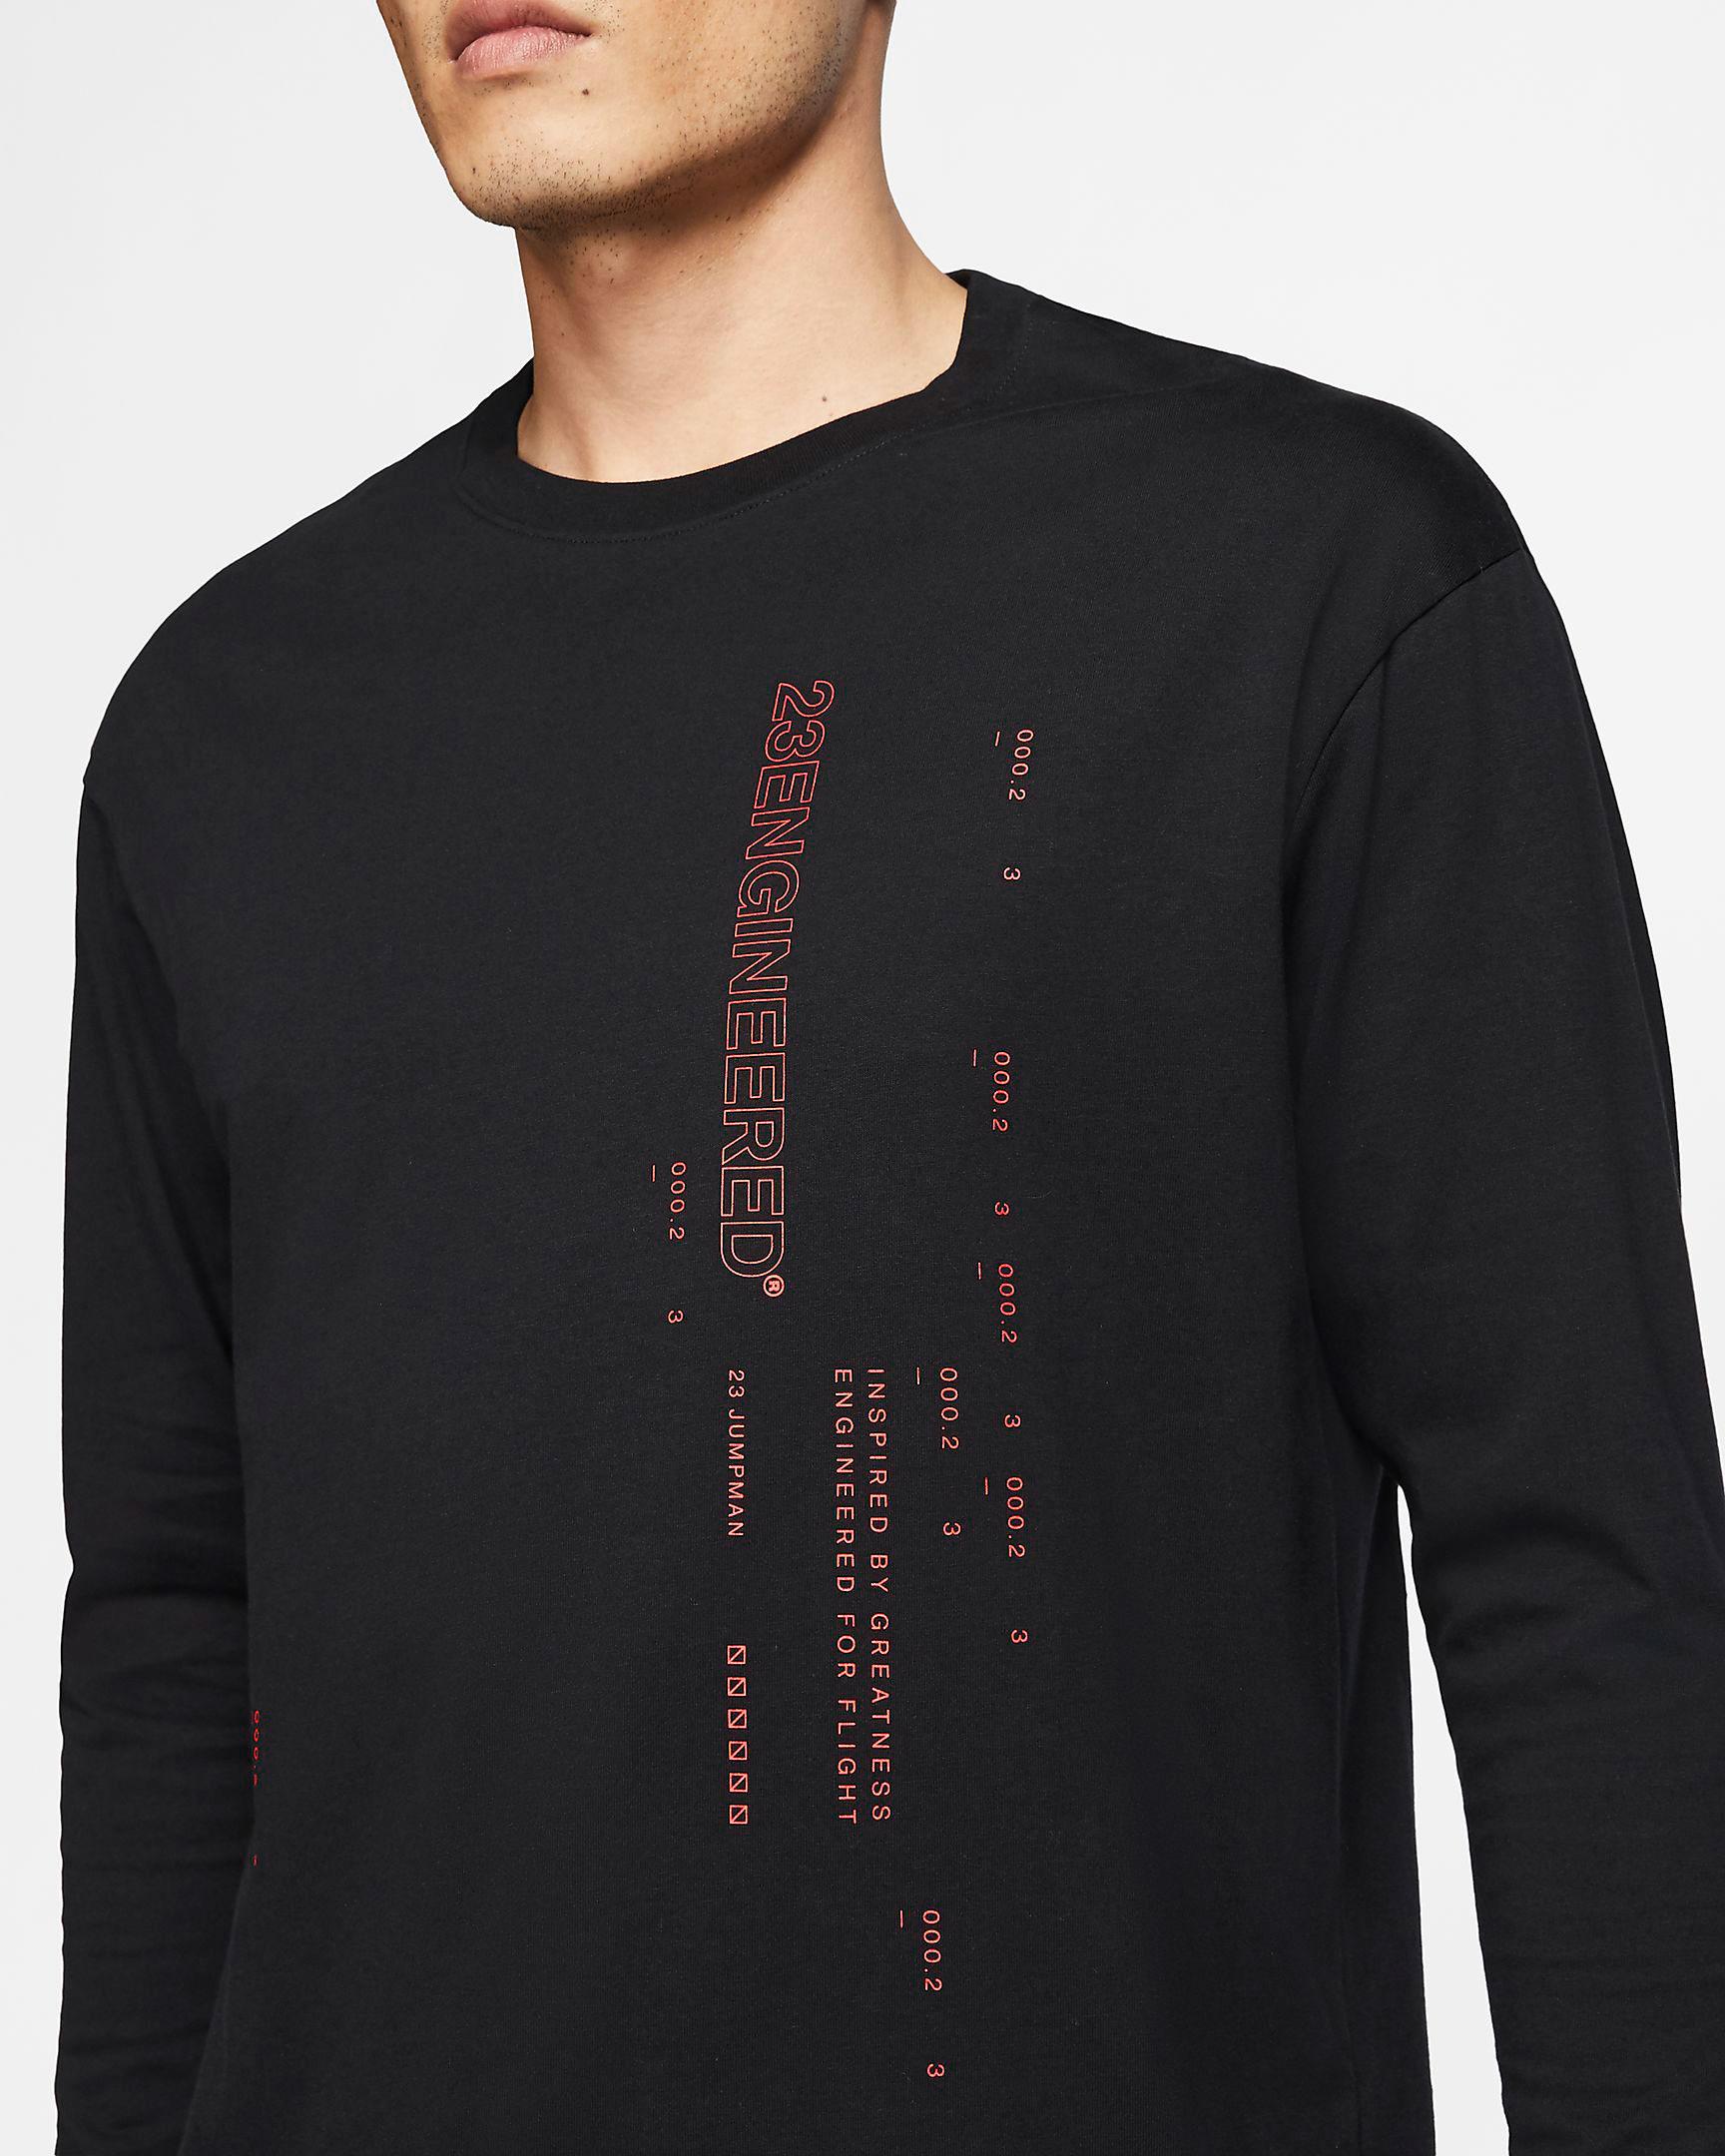 jordan-23-engineered-long-sleeve-shirt-black-red-3